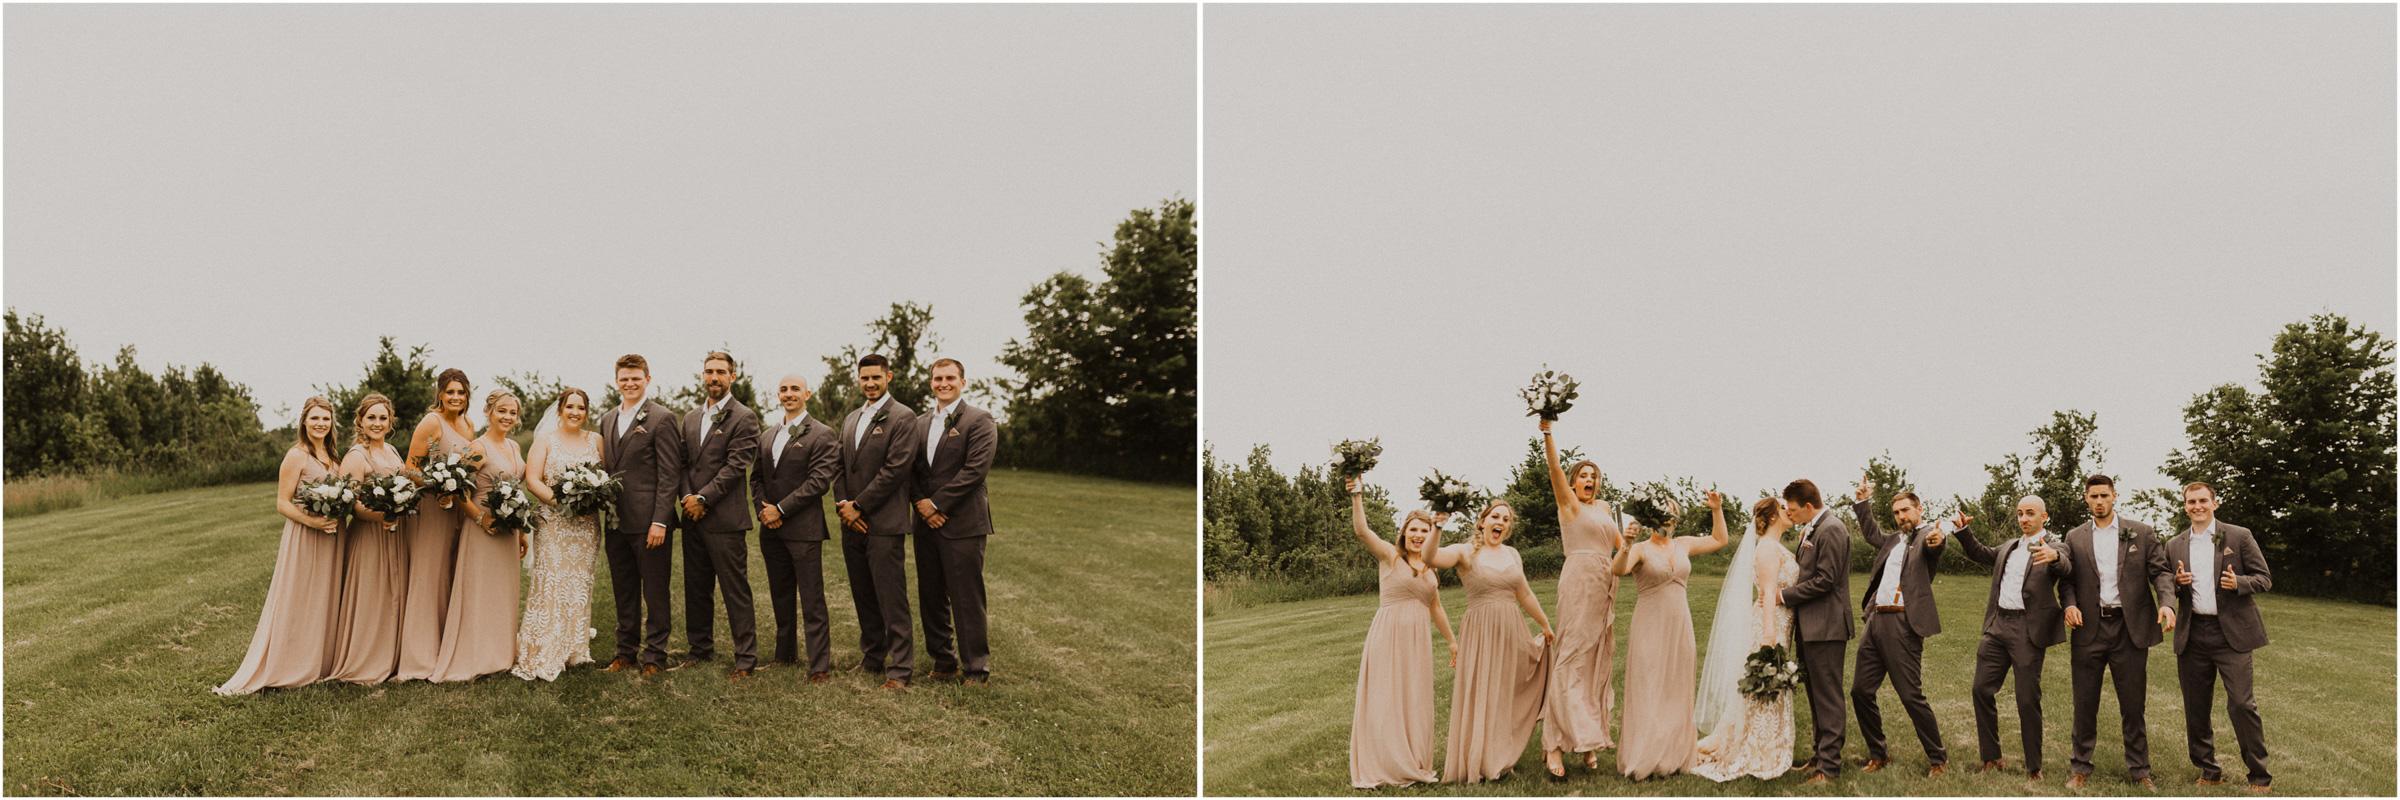 alyssa barletter photography weston red barn farm timberbarn summer outdoor wedding-25.jpg